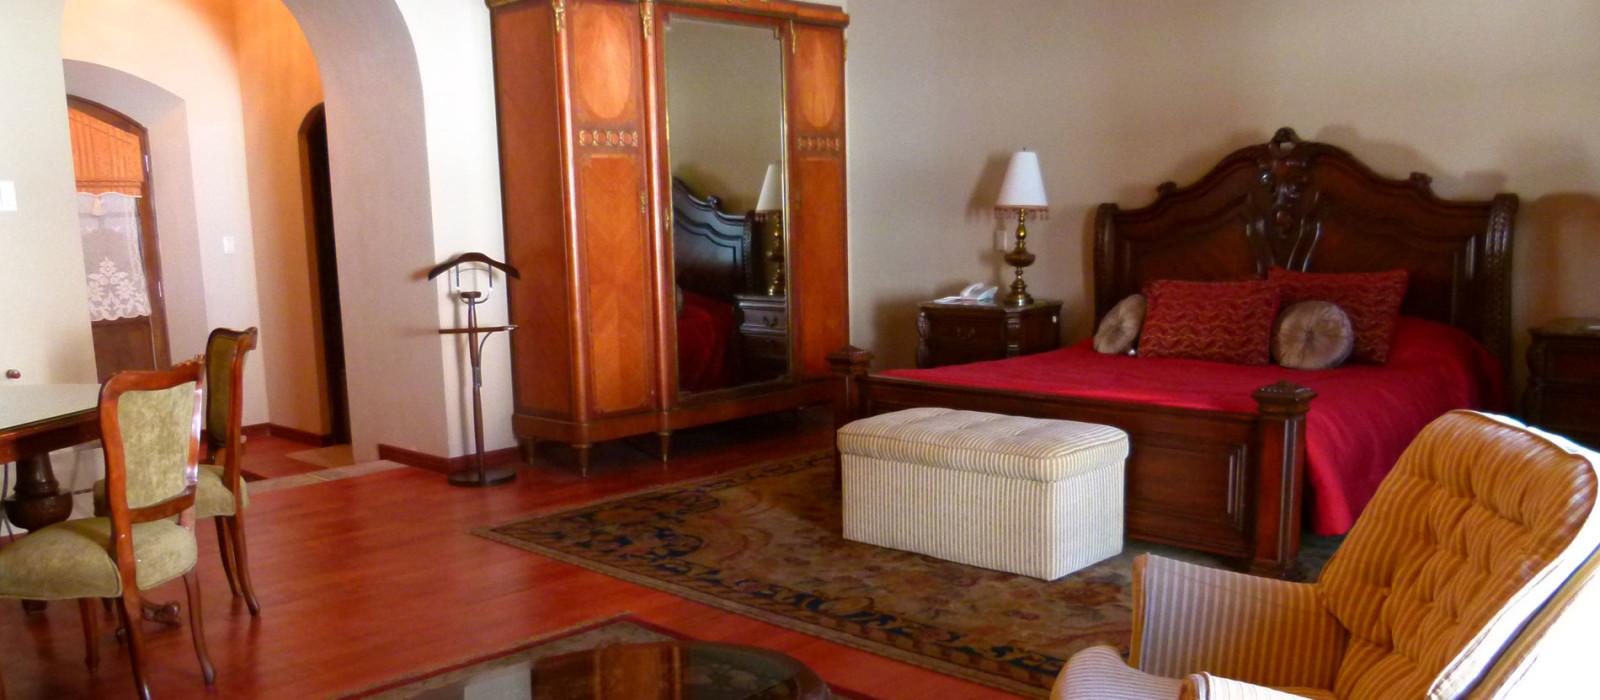 Hotel Parador Santa Maria La Real Bolivia